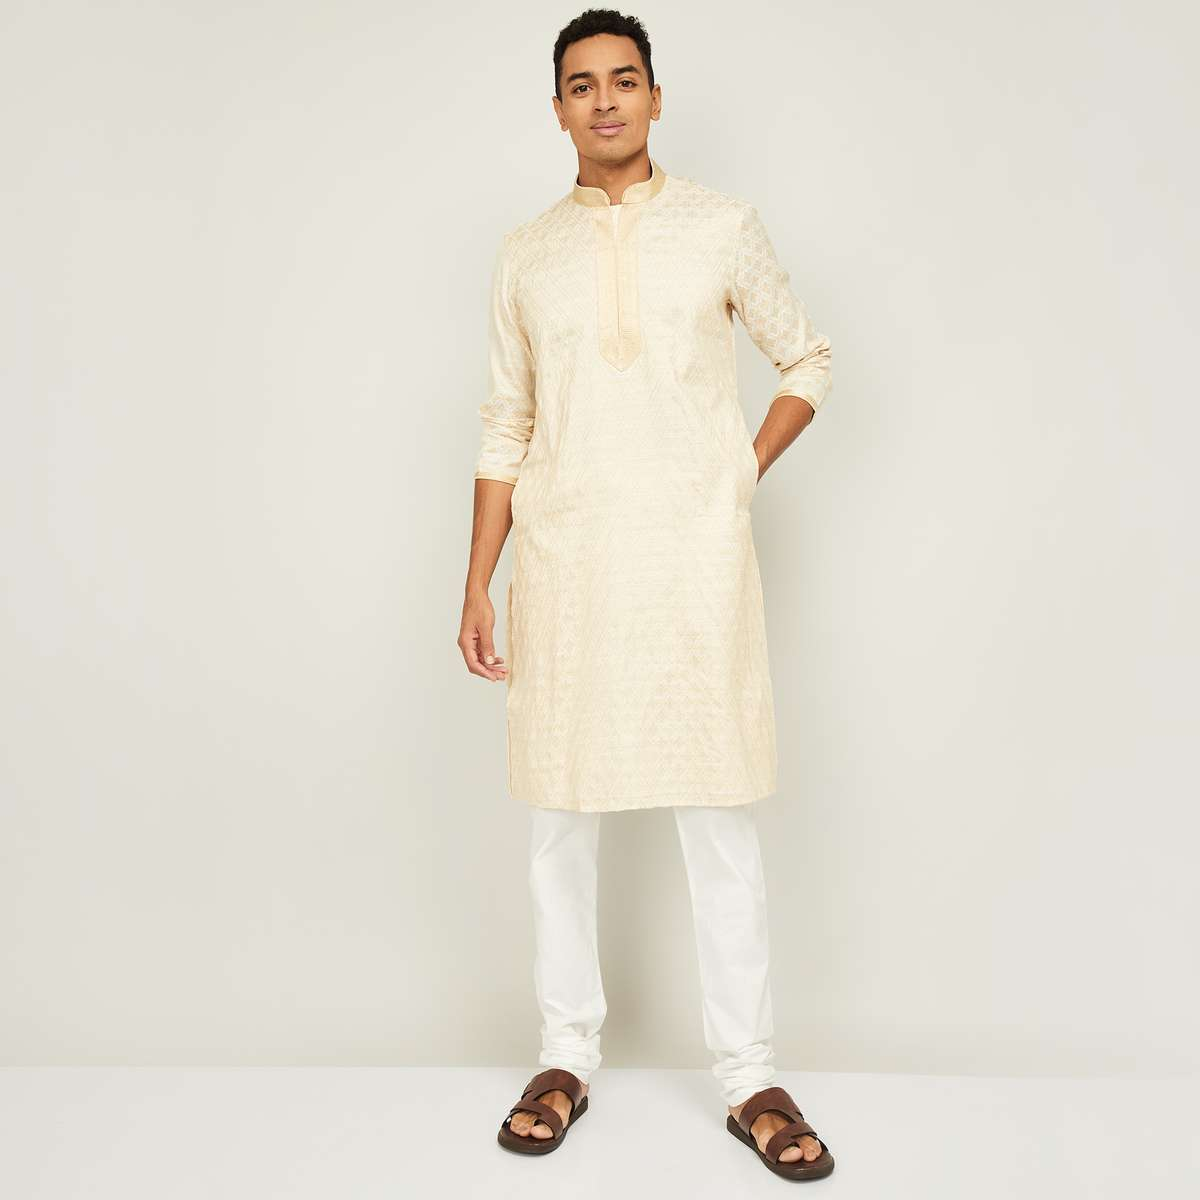 3.MELANGE Men Printed Kurta with Solid Pyjamas